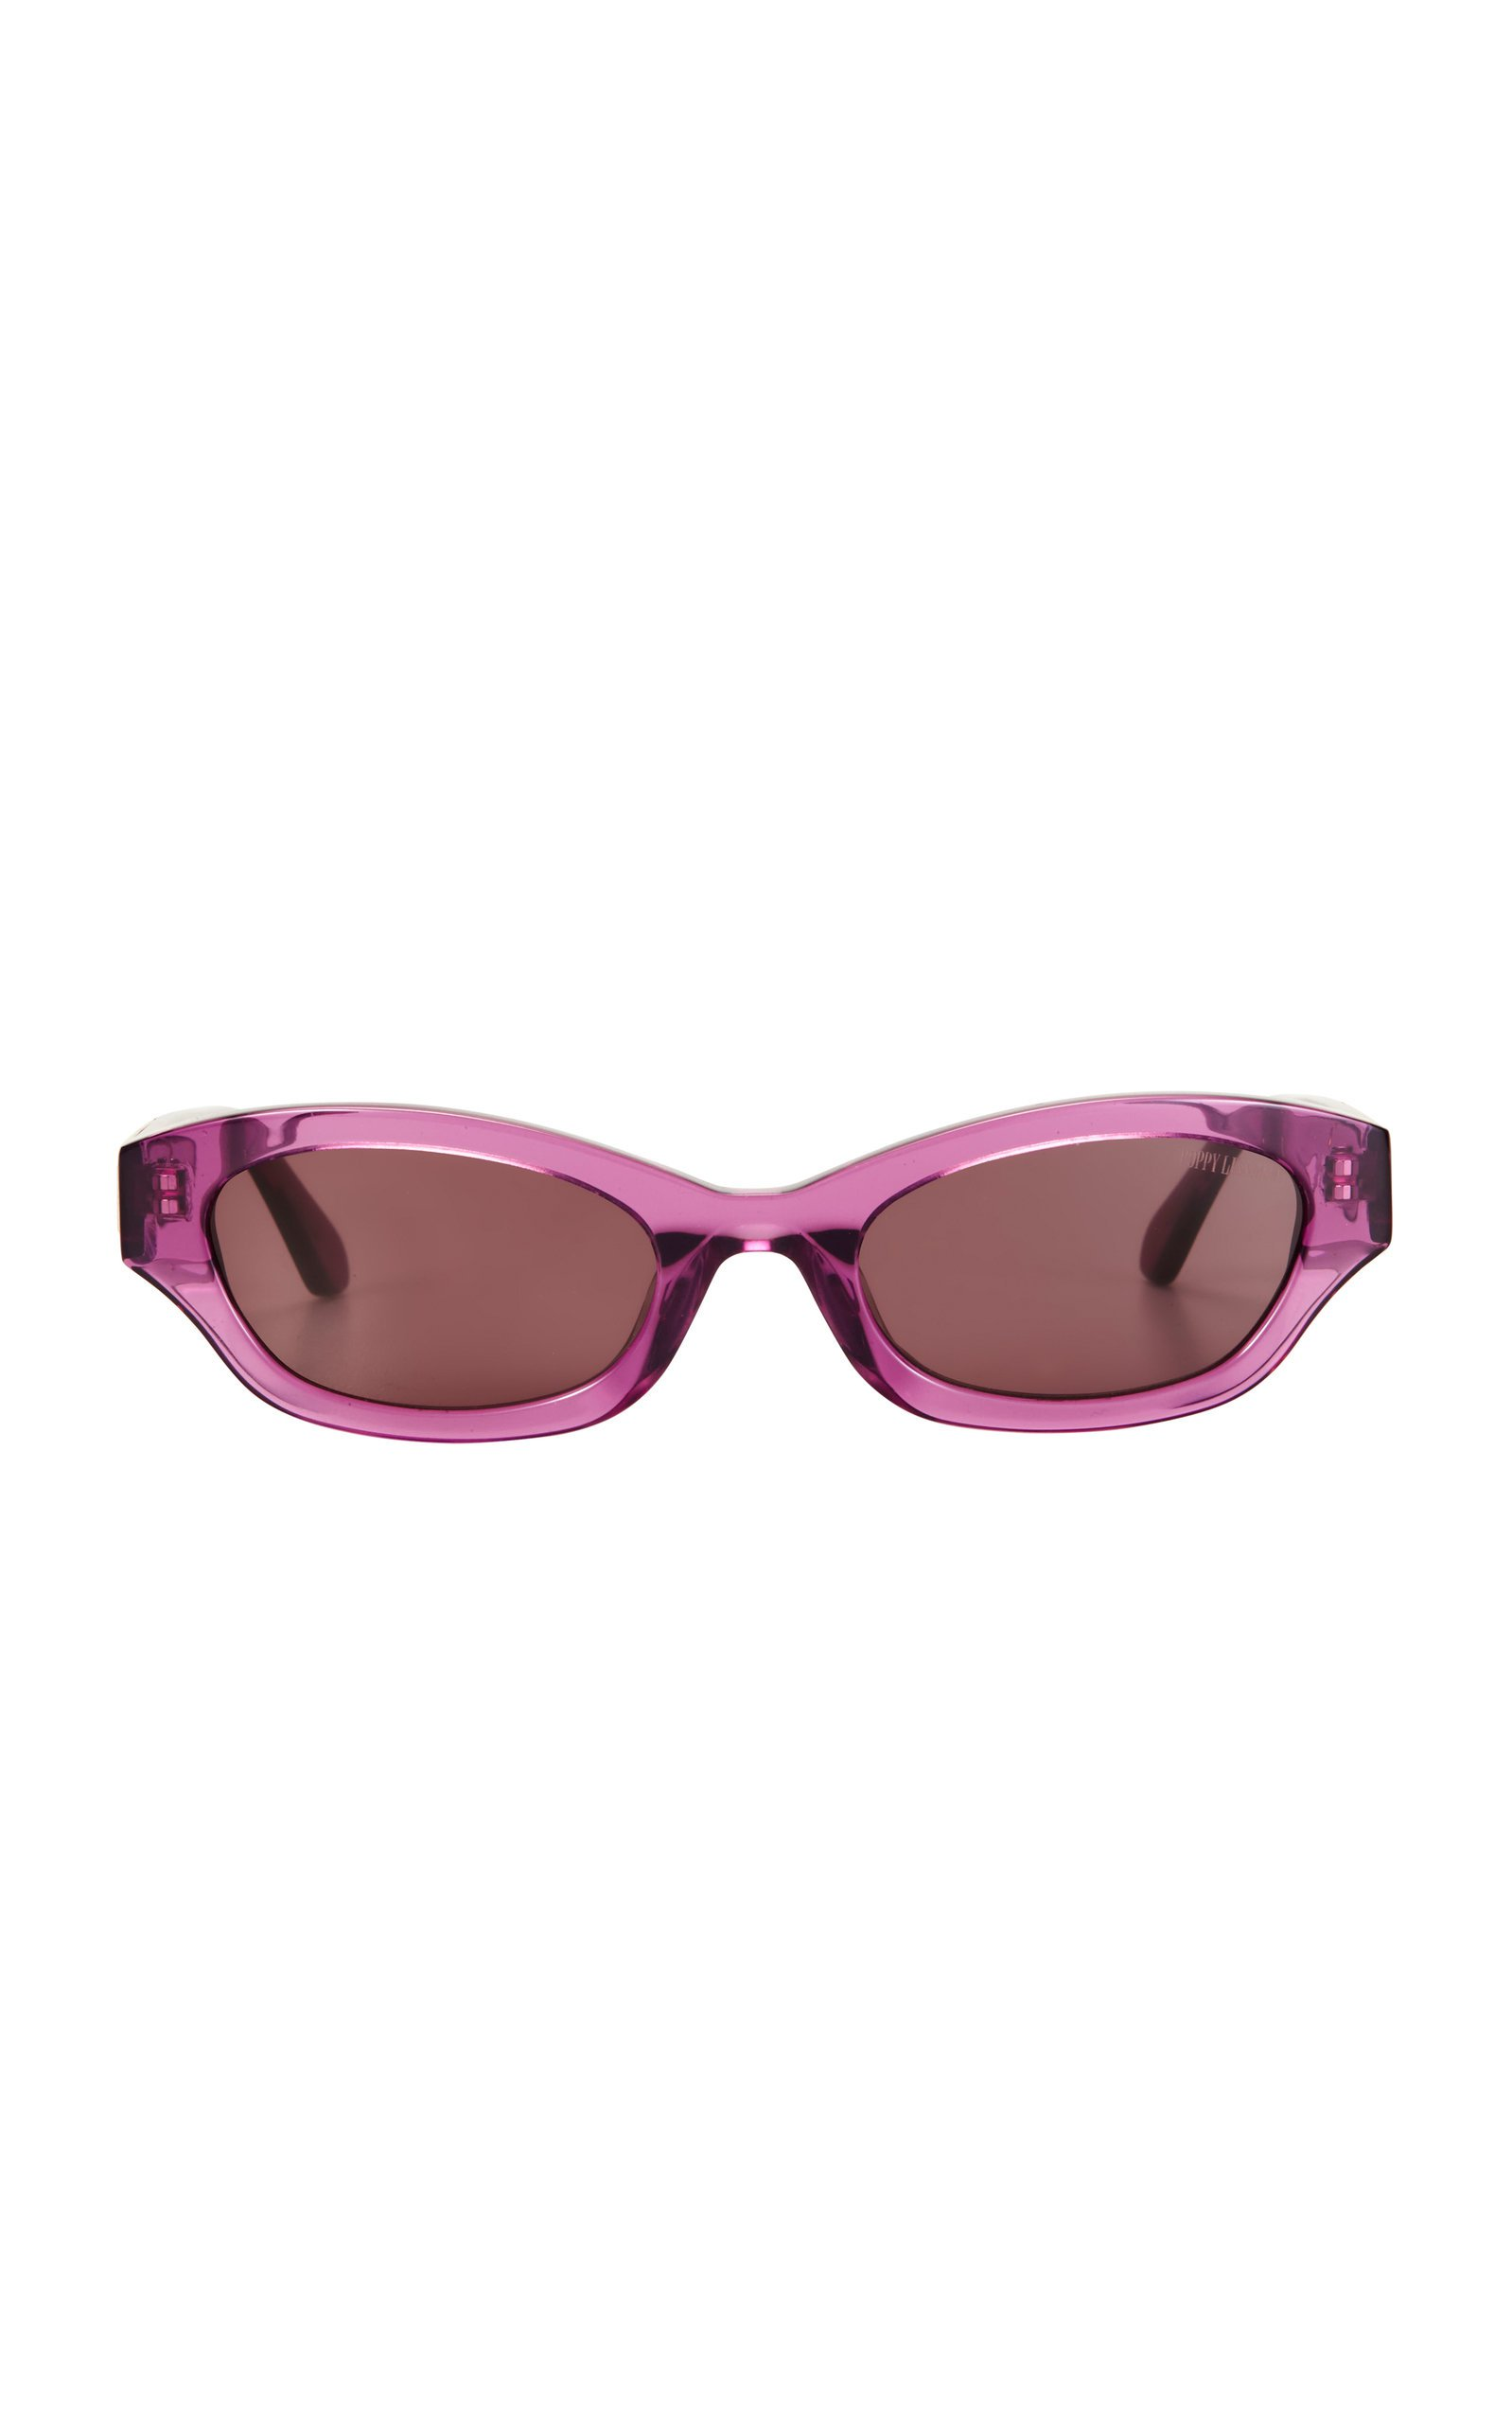 Poppy Lissiman Courtney Cat-Eye Sunglasses